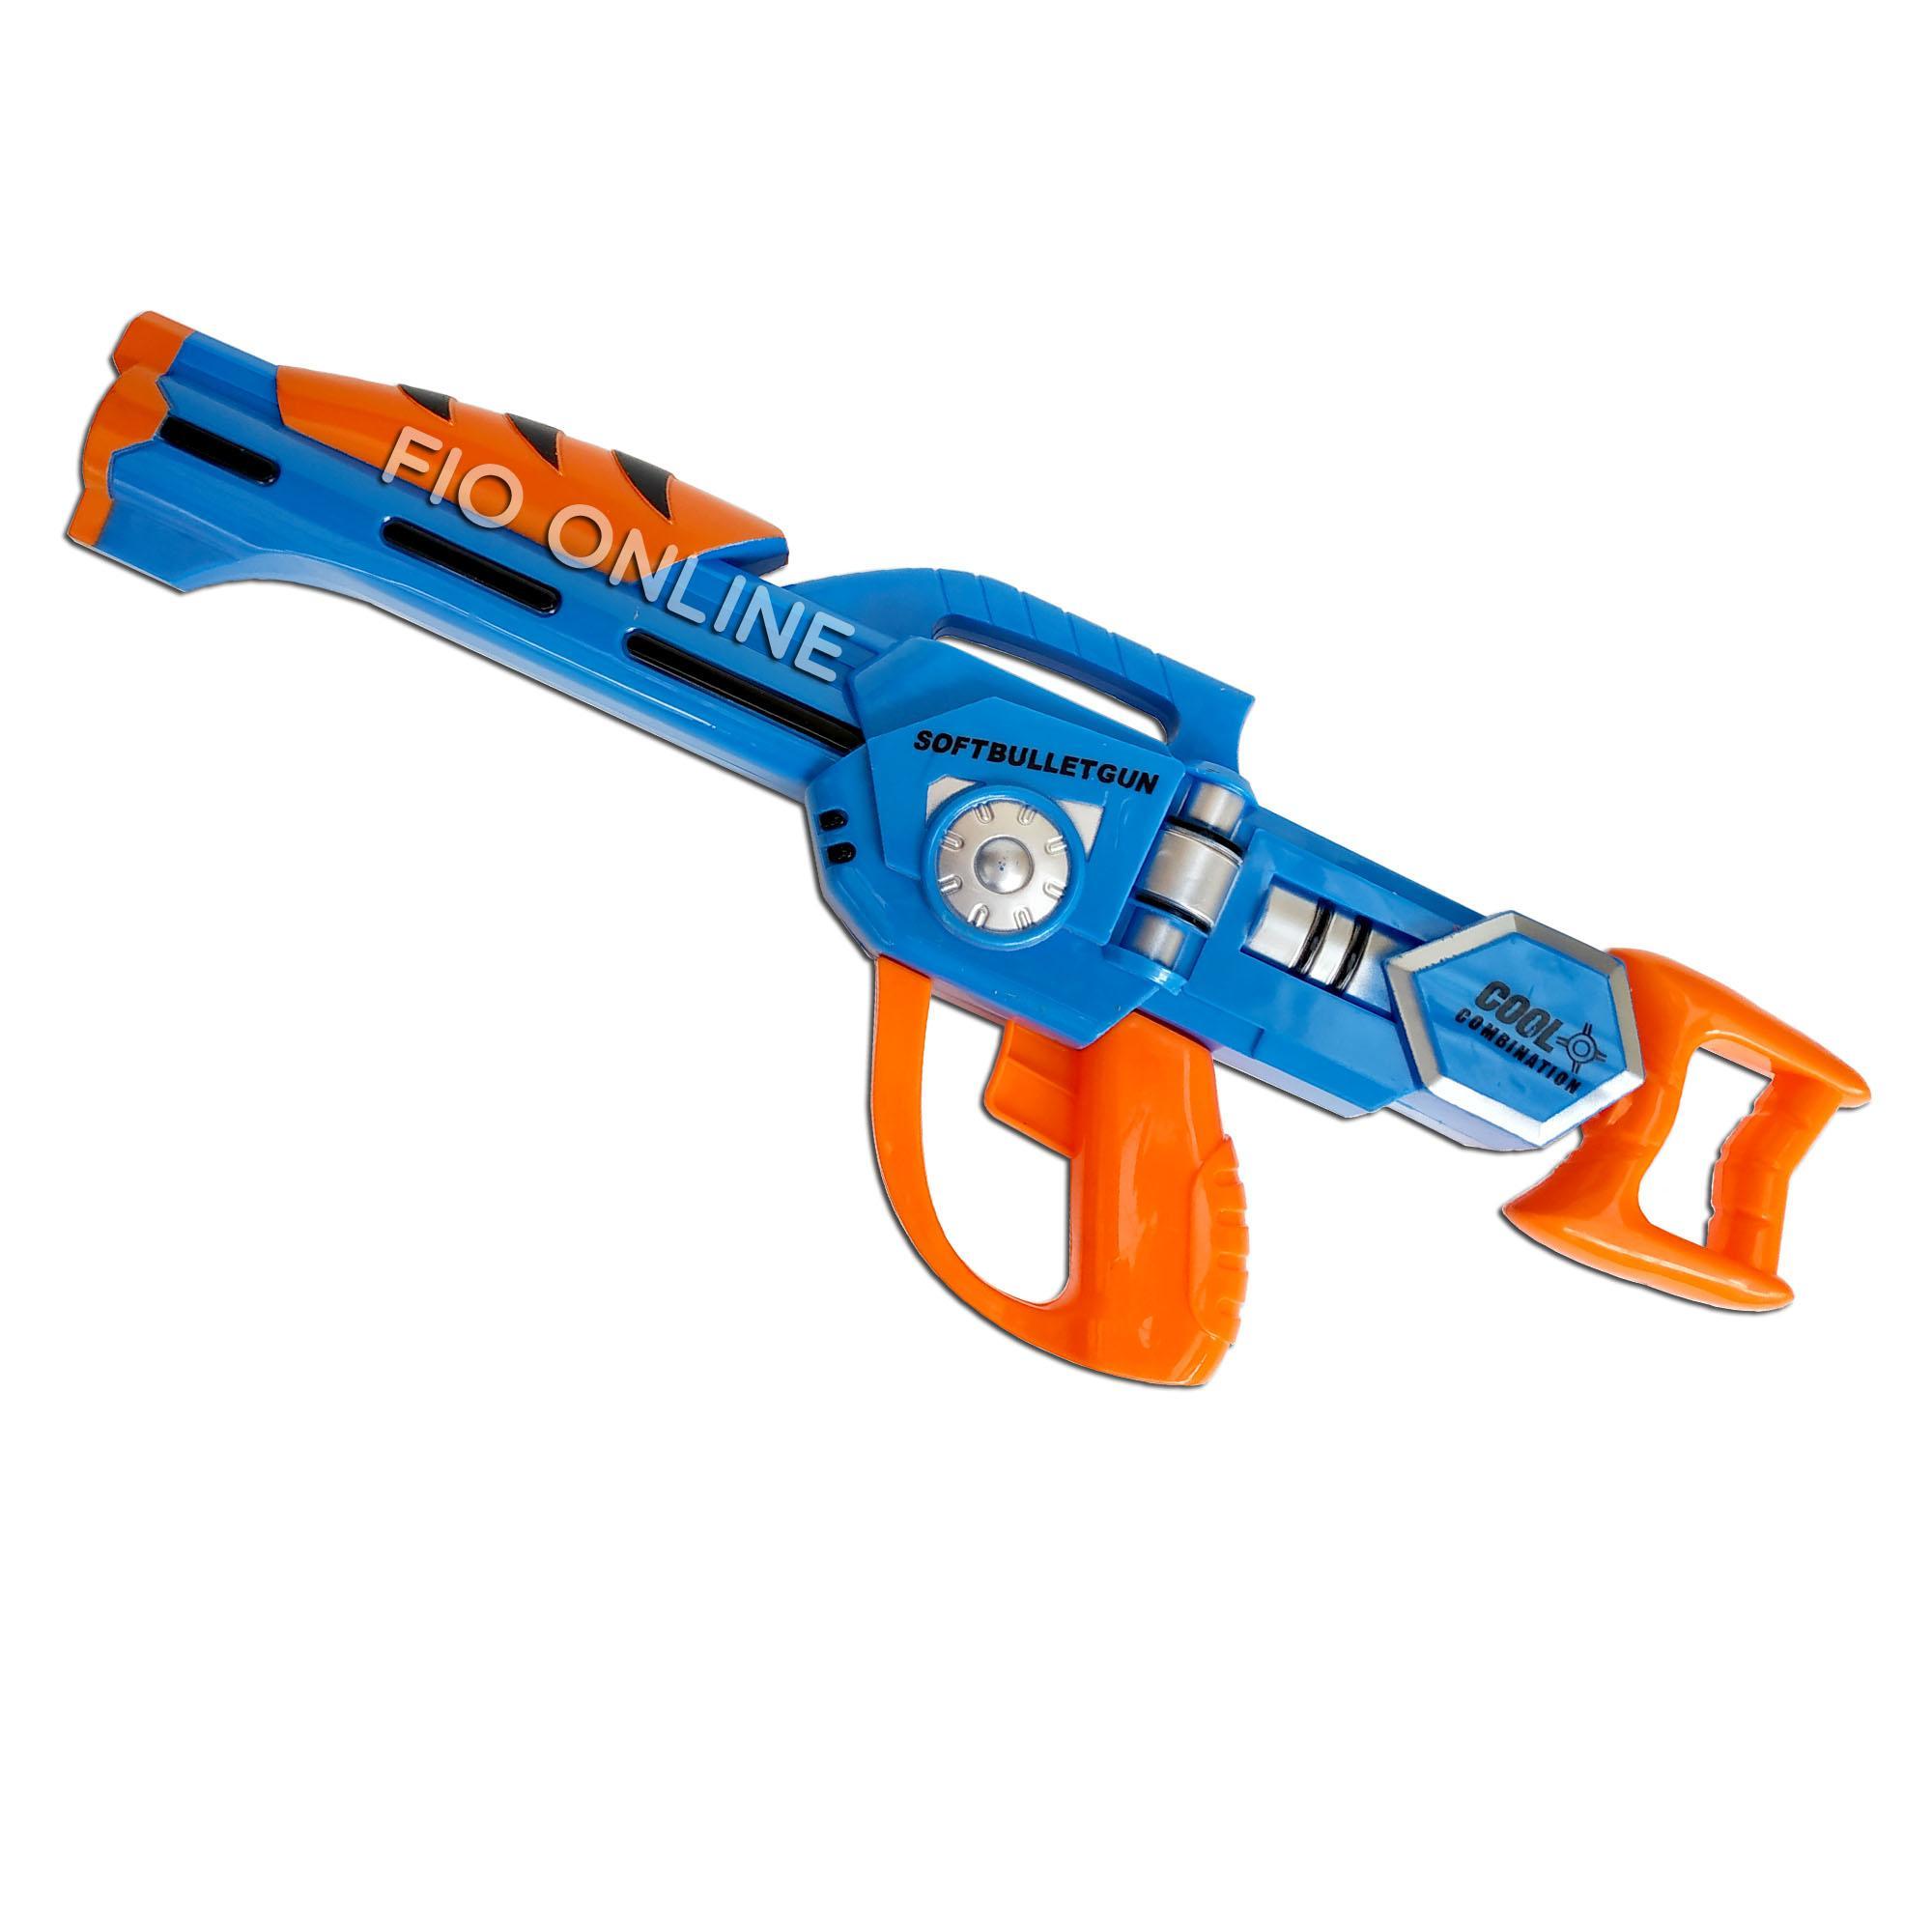 Fio Online Jl3877a Pd3835a Mainan Rapid Fire Dart Blasting Pistol Senjata Tembakan Soft Bullet Gun Toys - Peluru Lembut - Biru By Fio Online